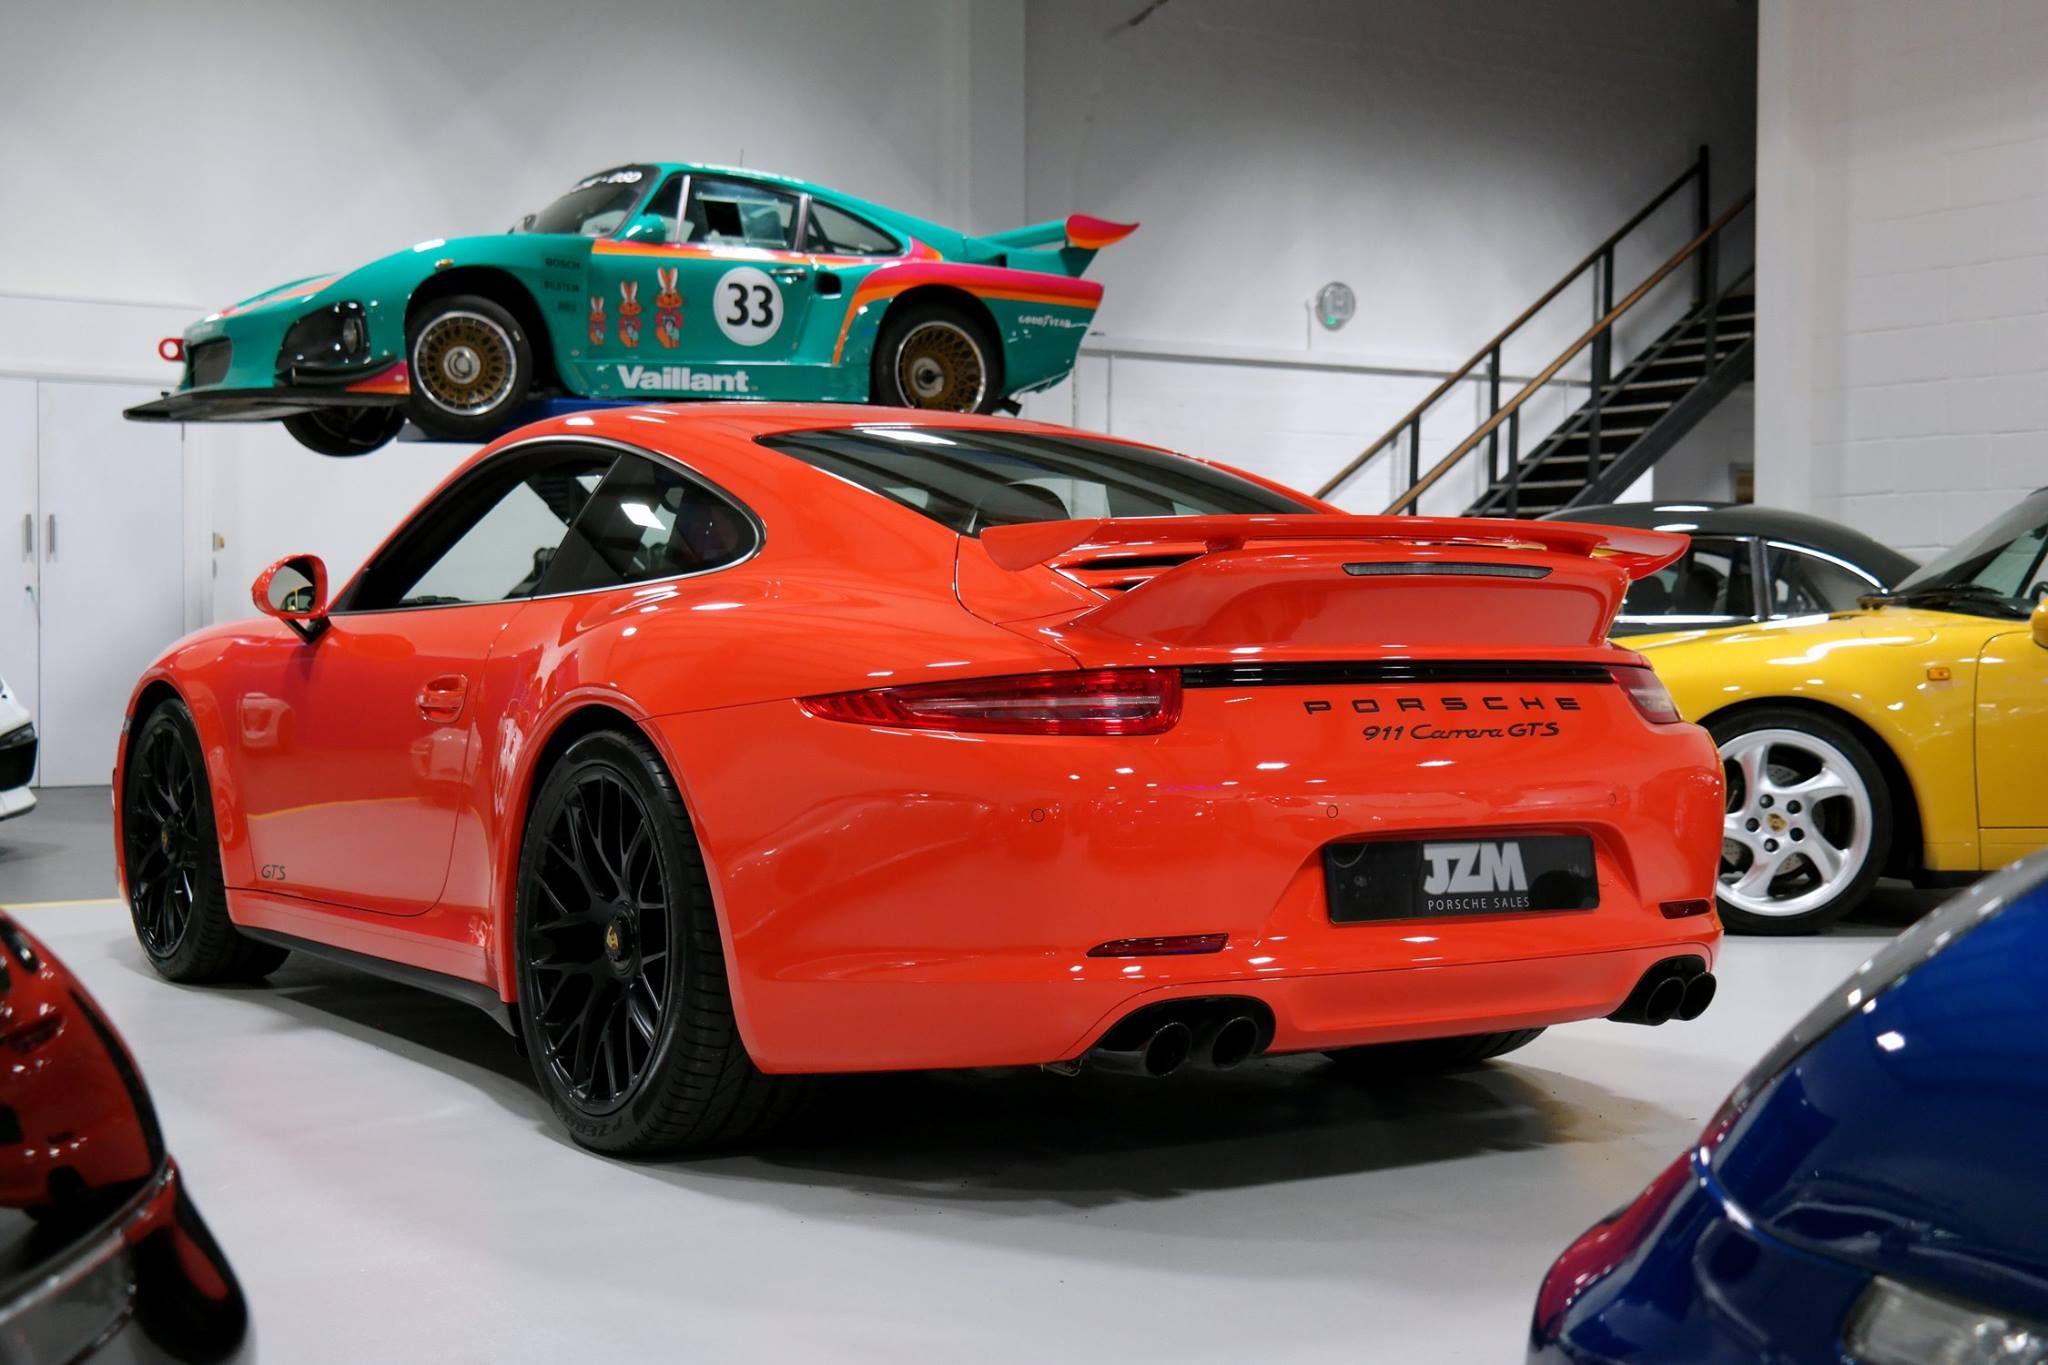 Porsche Gts Porsche Porsche Gts Porsche 911 Targa